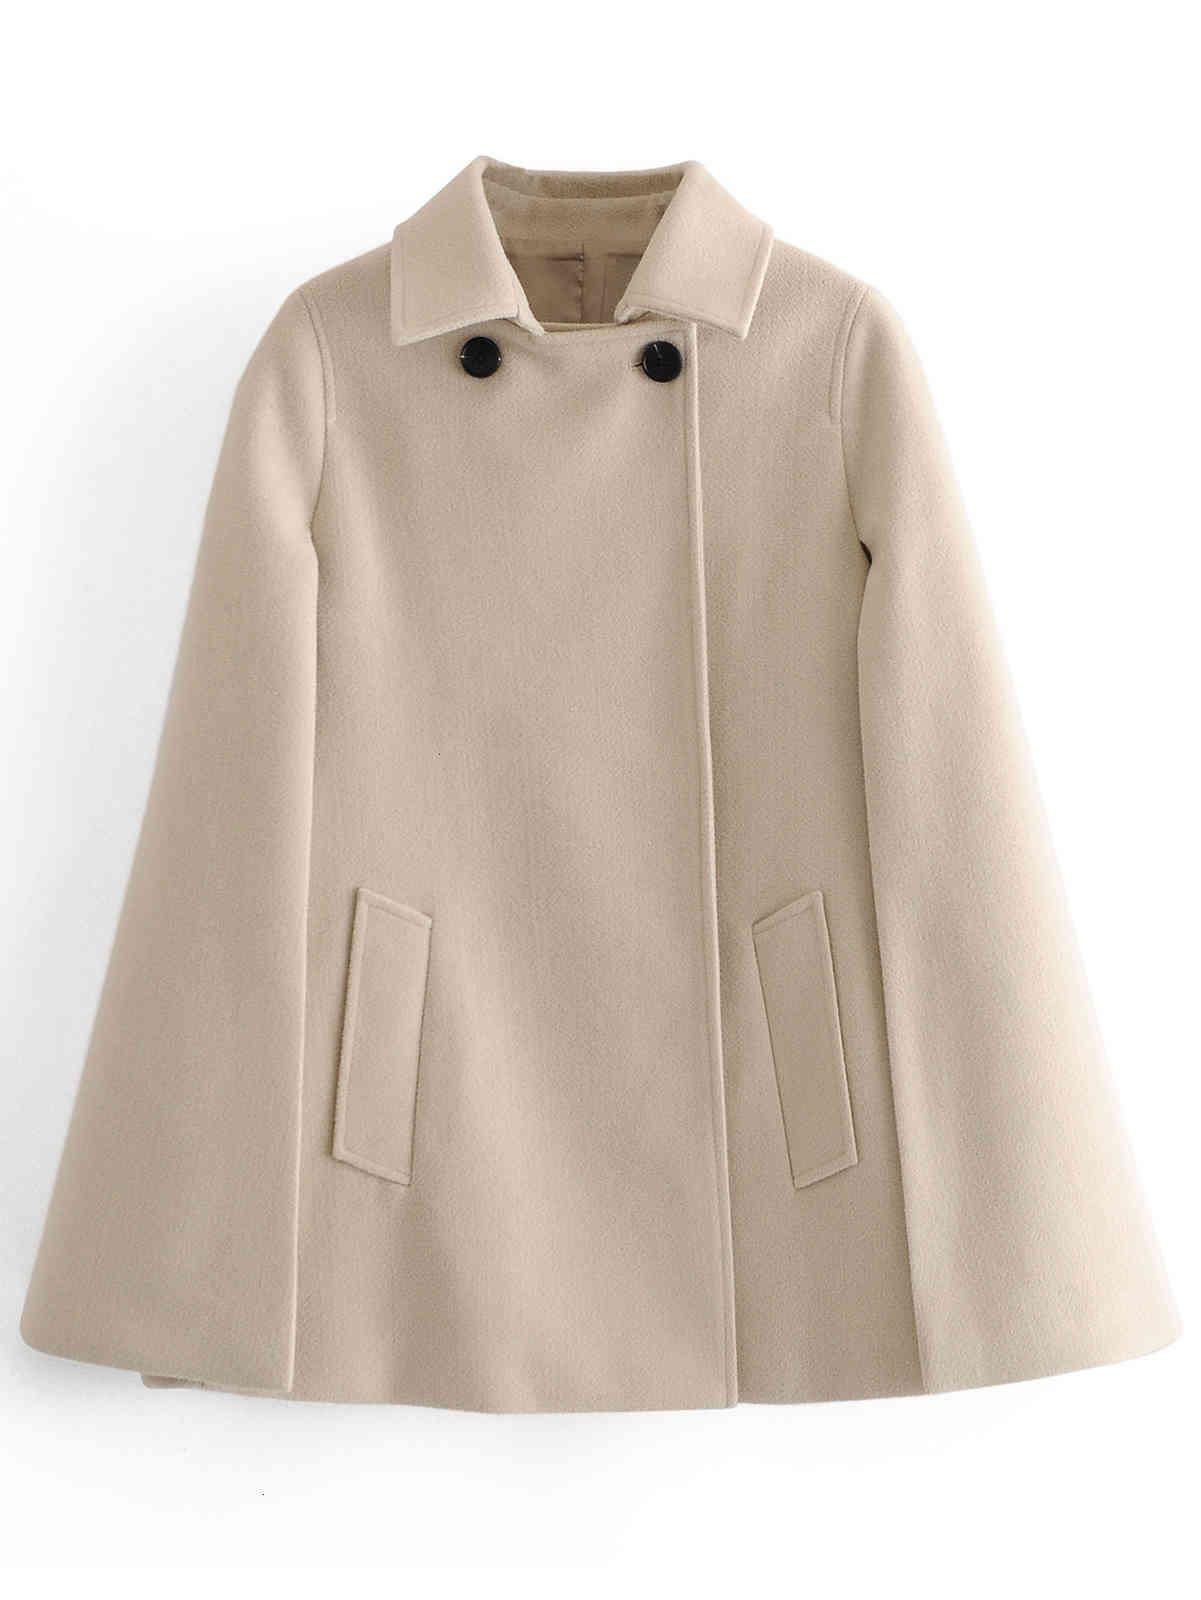 Jaquetas femininas 89127 Outono Europeu e American Cape Coat B9nd